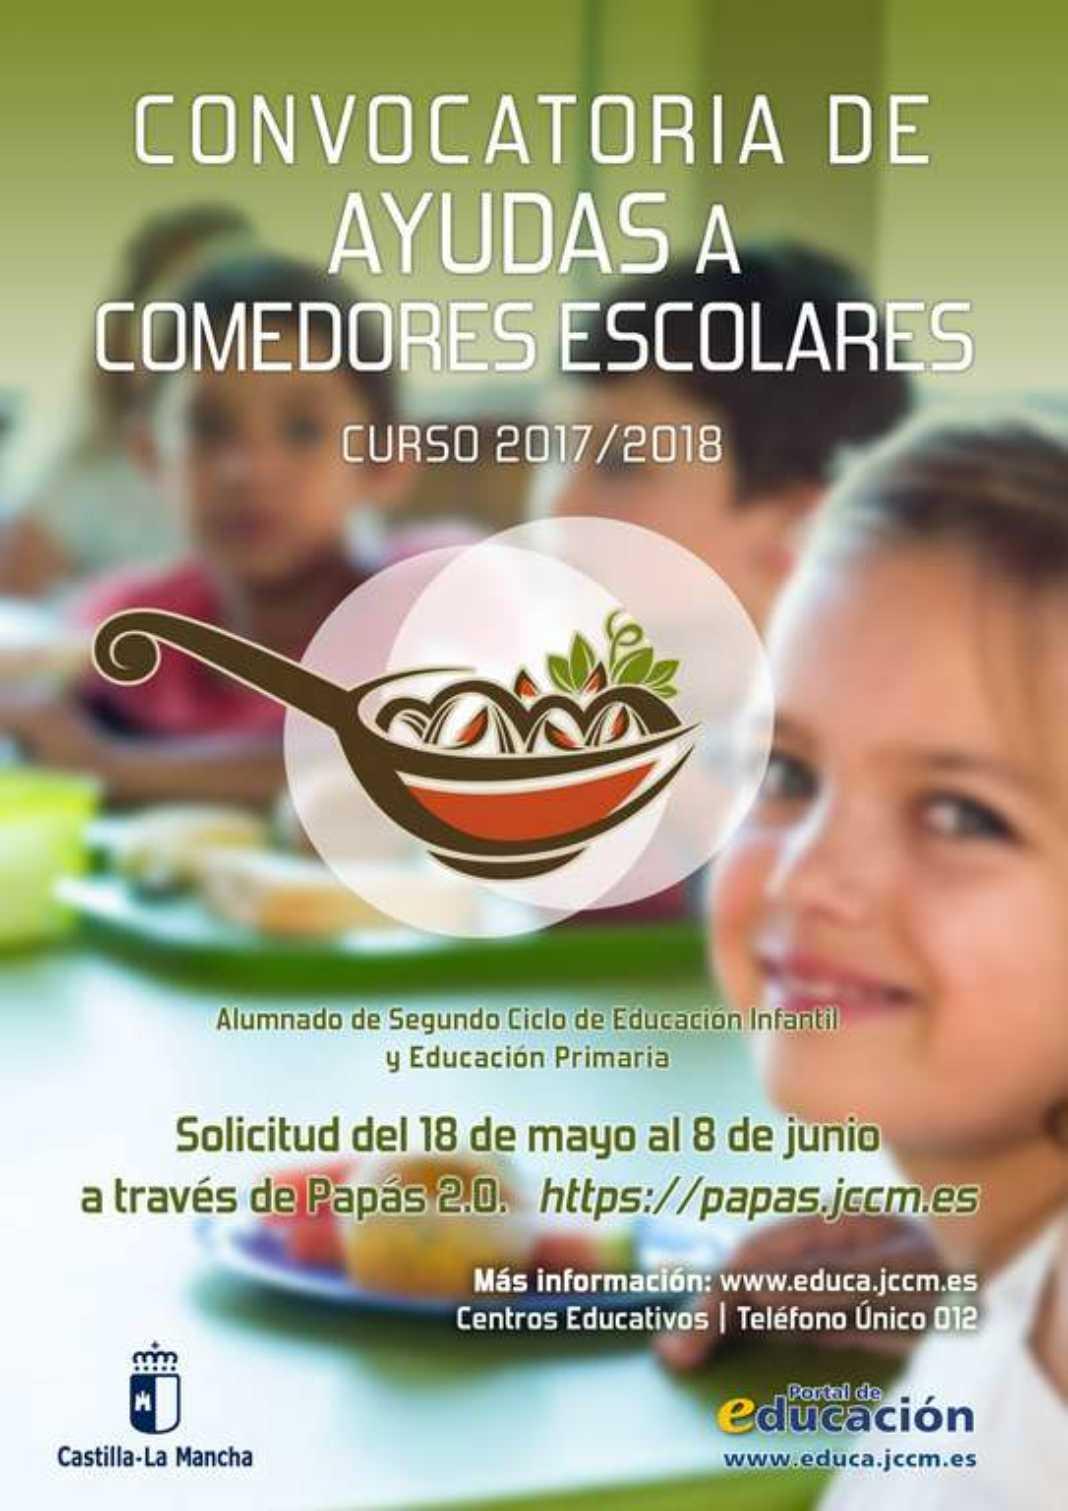 CartelComedoresEscolares2017 1068x1511 - Convocatoria de Ayudas a Comedores Escolares. Curso 2017/2018